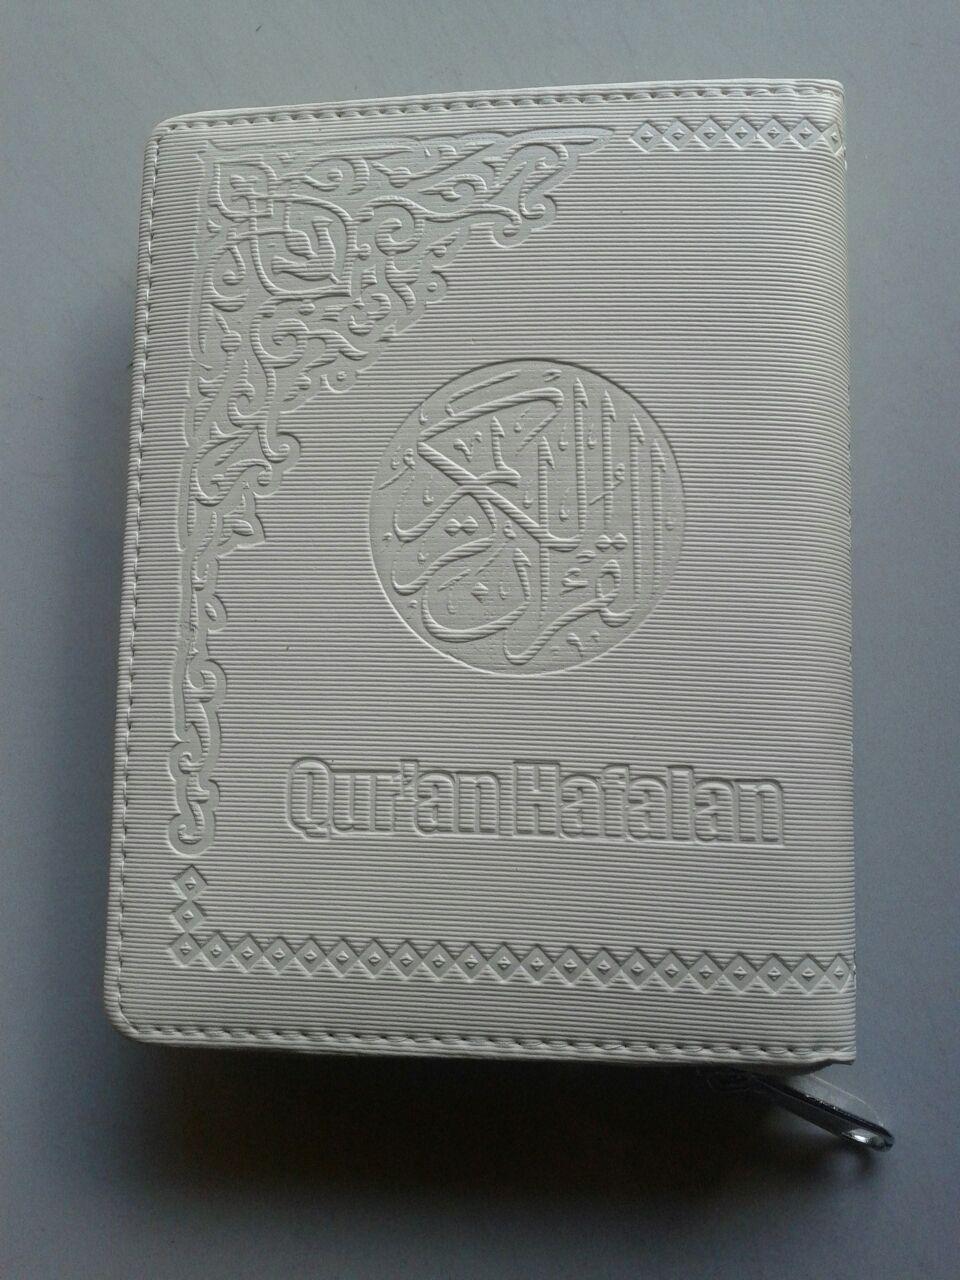 Al-Qur'an Hafalan Mushaf Rit Ukuran A6 cover